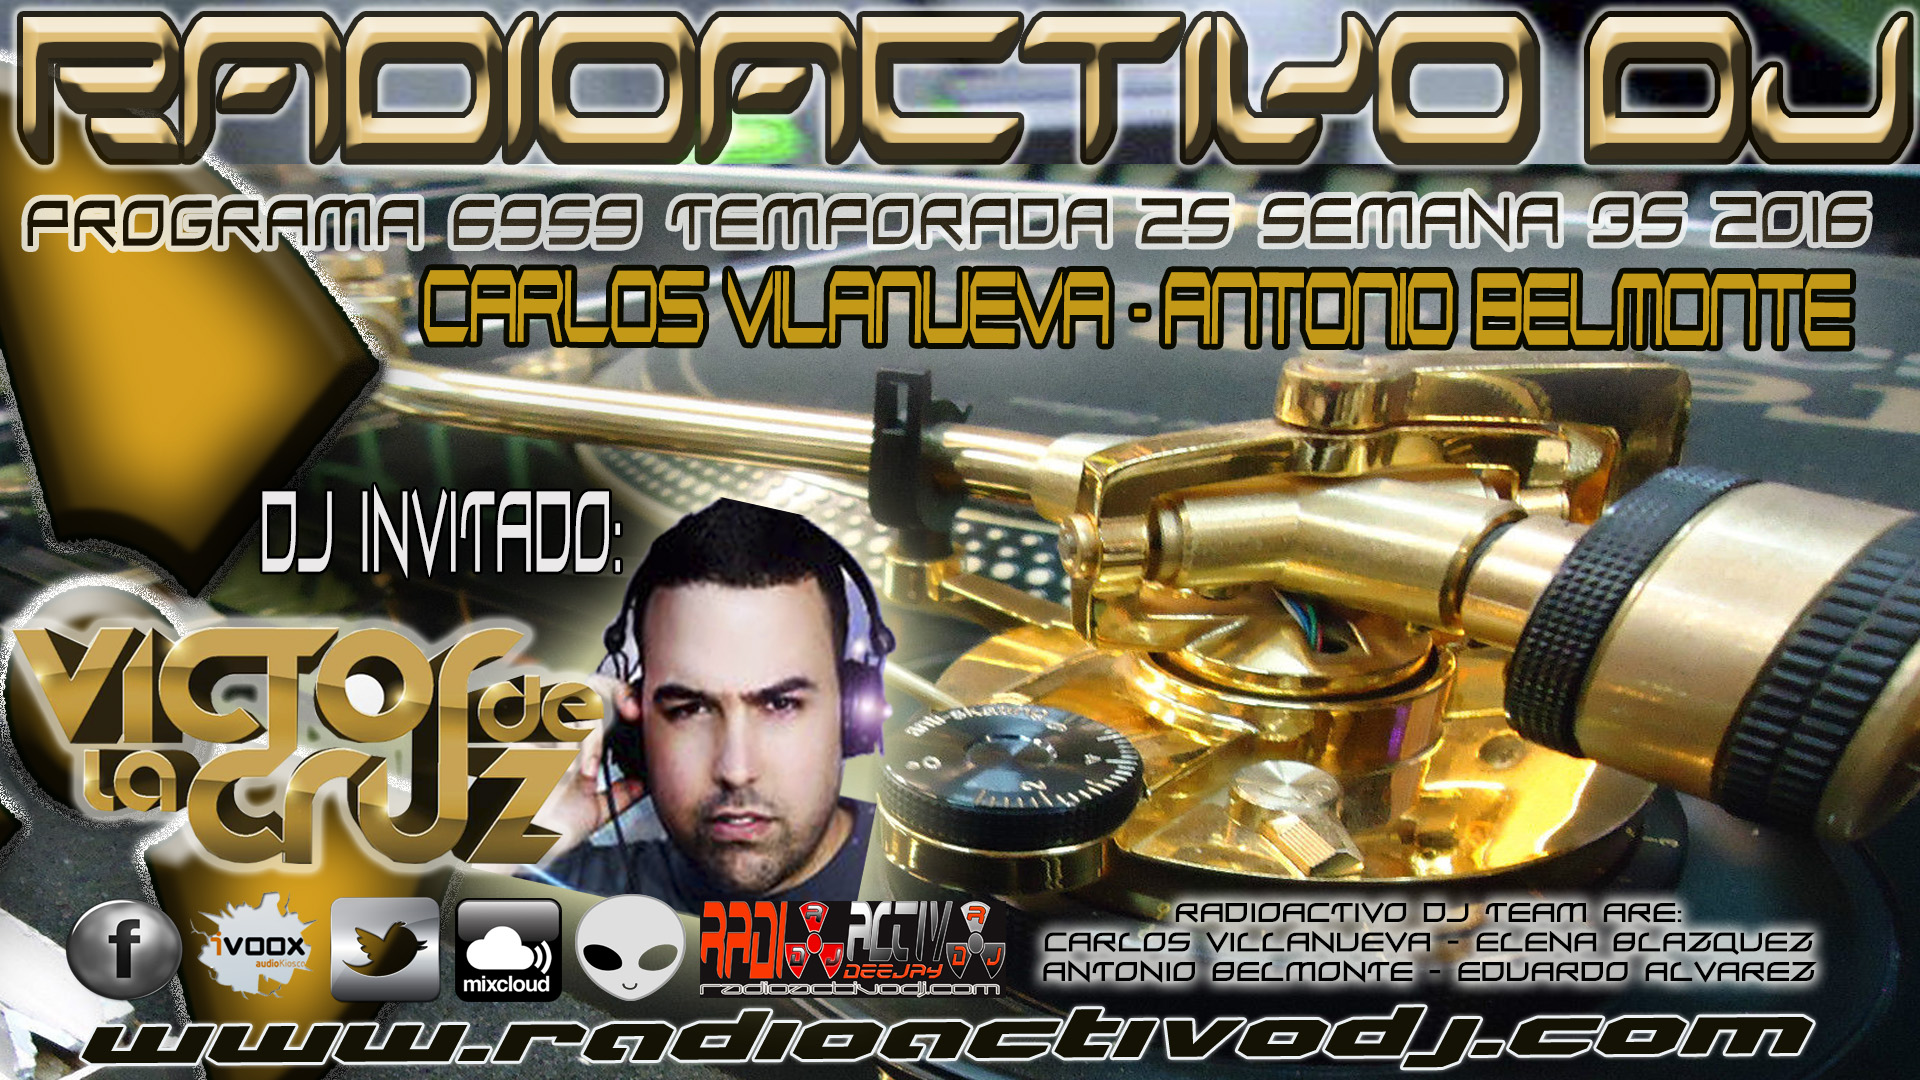 RADIOACTIVO-DJ-35-2016